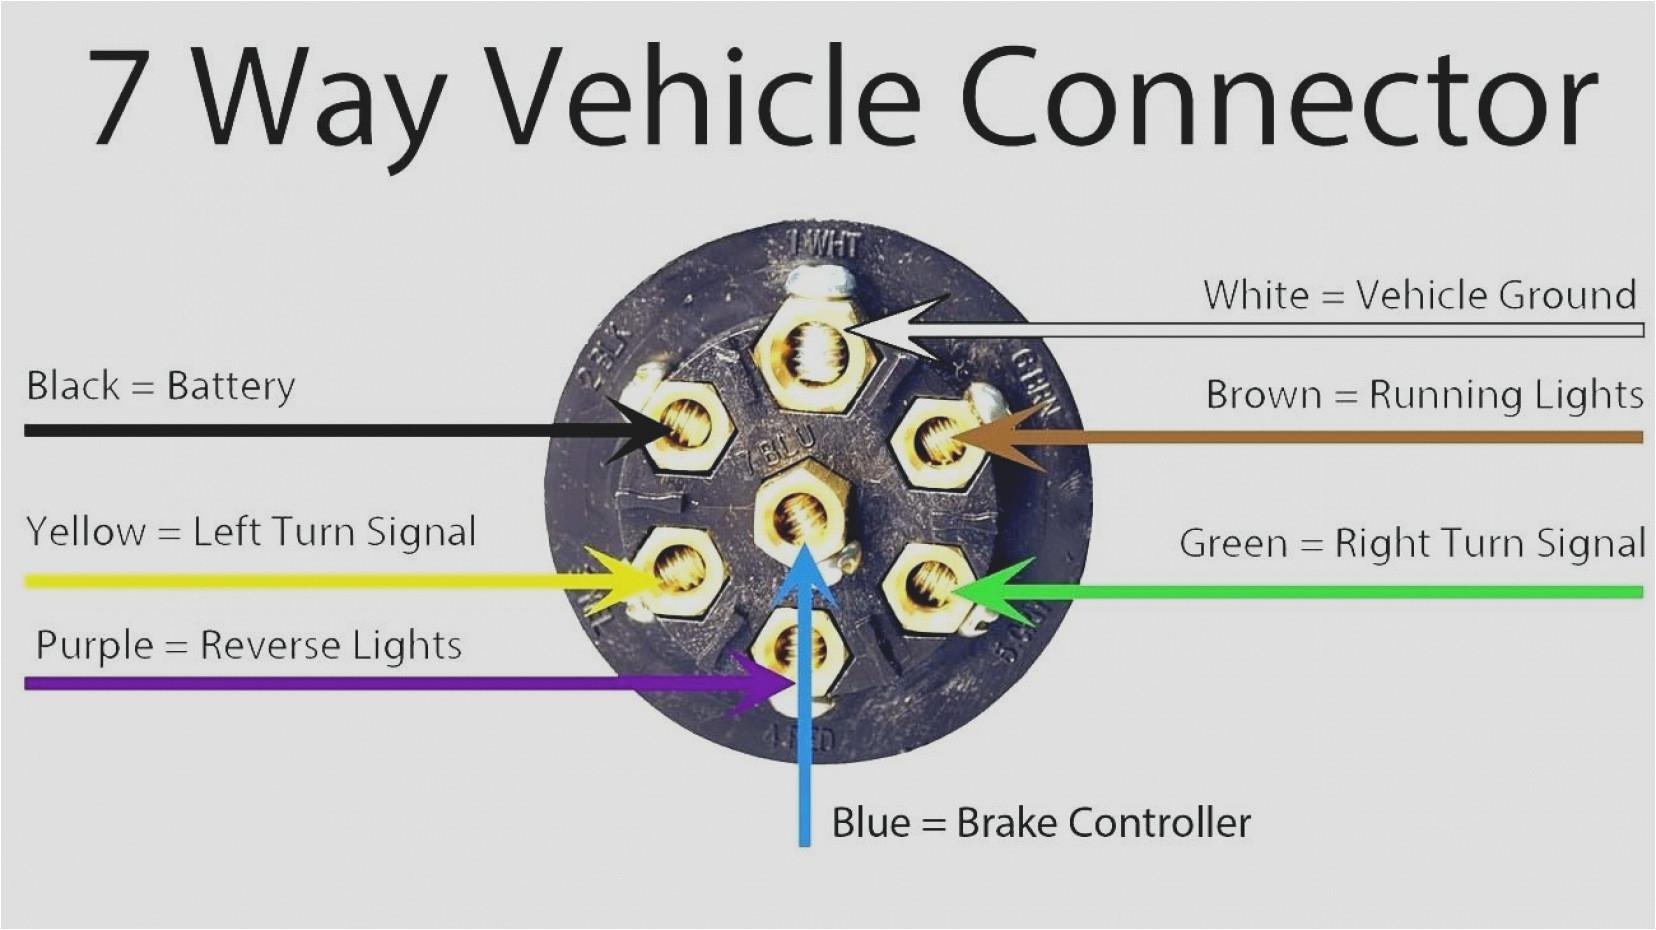 toyota 7 way wiring diagram wiring diagrams mix toyota 7 pin wiring harness schema diagram database electrical trailer